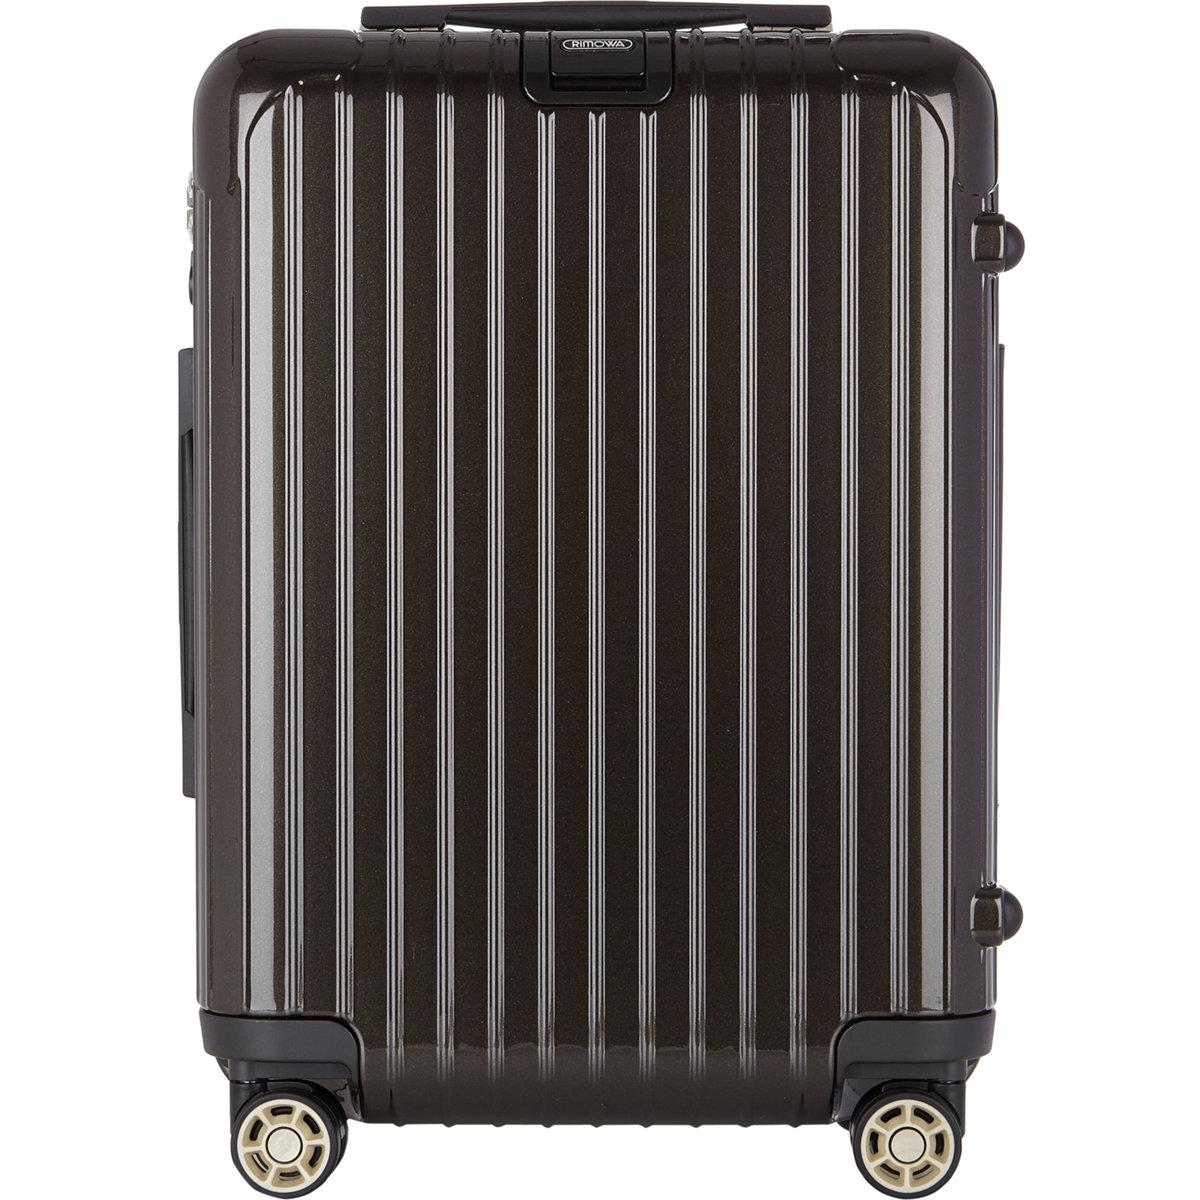 Rimowa salsa deluxe 22 cabin multiwheel iata suitcase in for Salsa deluxe cabin multiwheel